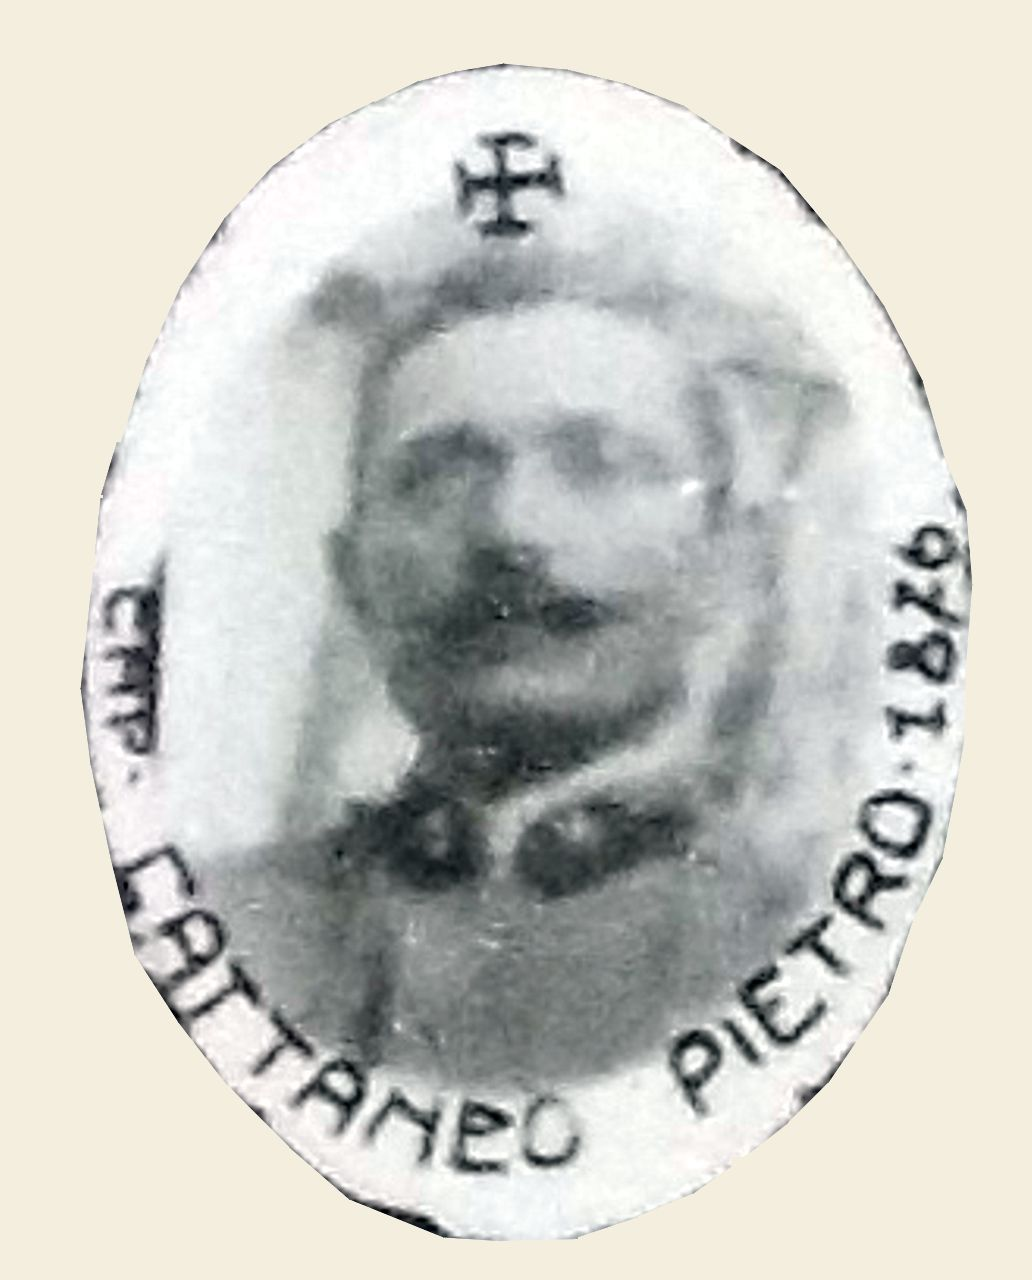 Cattaneo Pietro